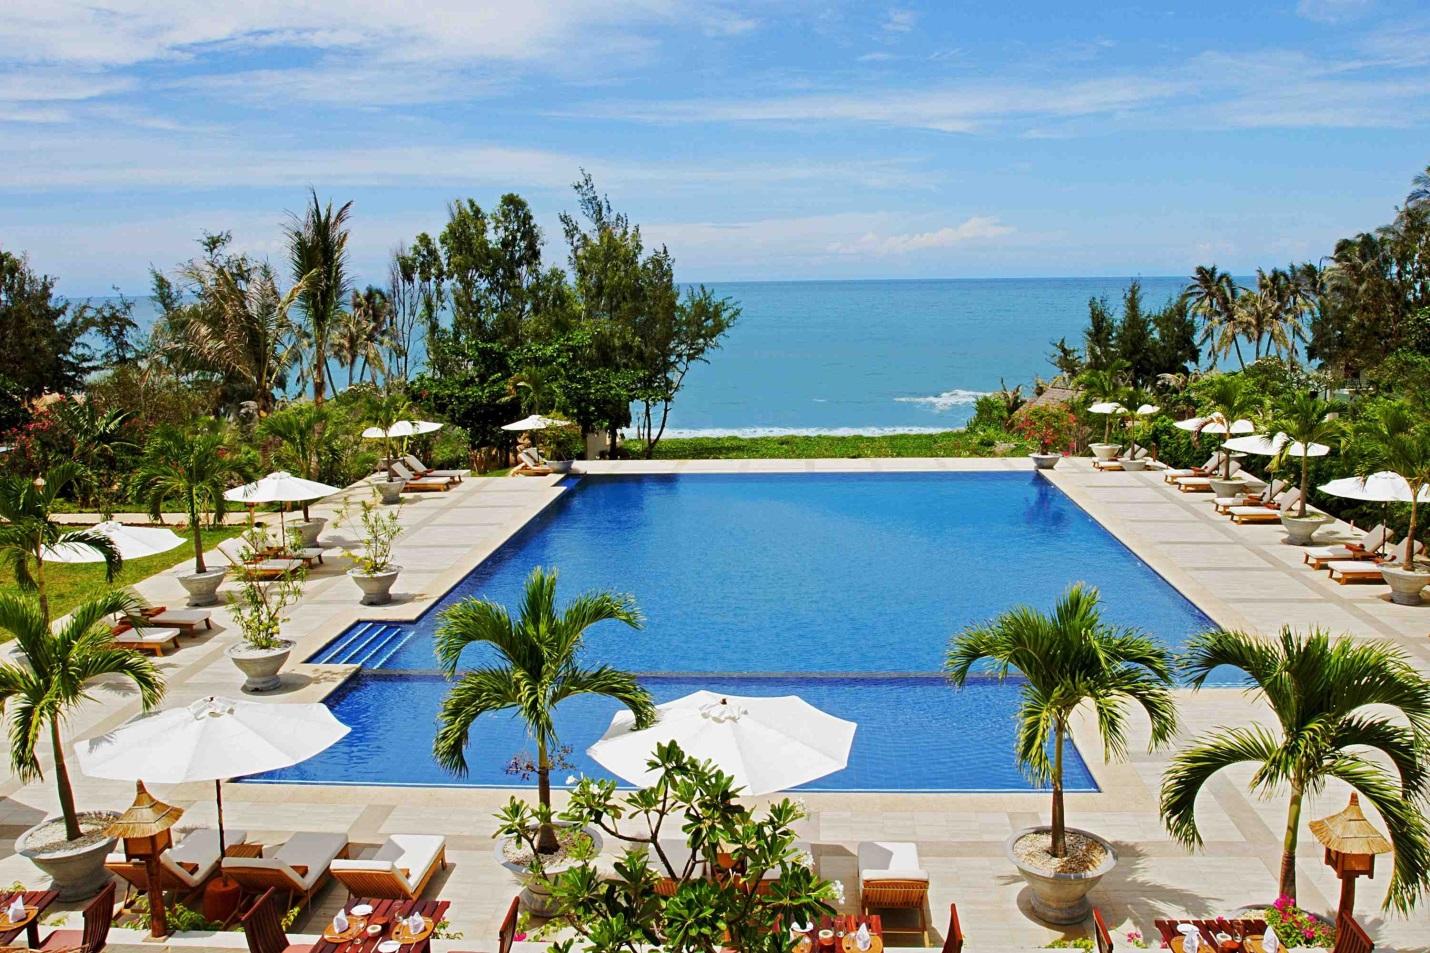 High-standard hotel accommodation in Mui Ne